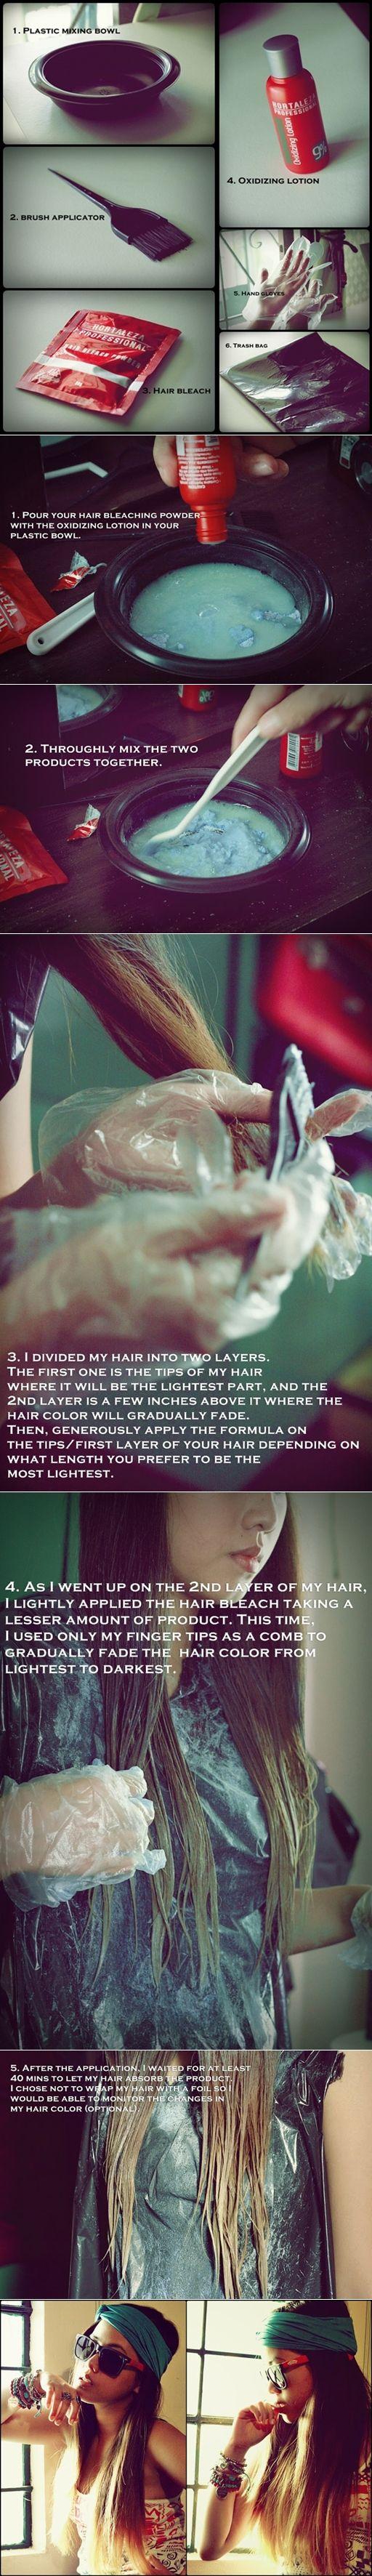 DIY Ombre Hair tutorial. Check out my blog! www.itsnikki.com